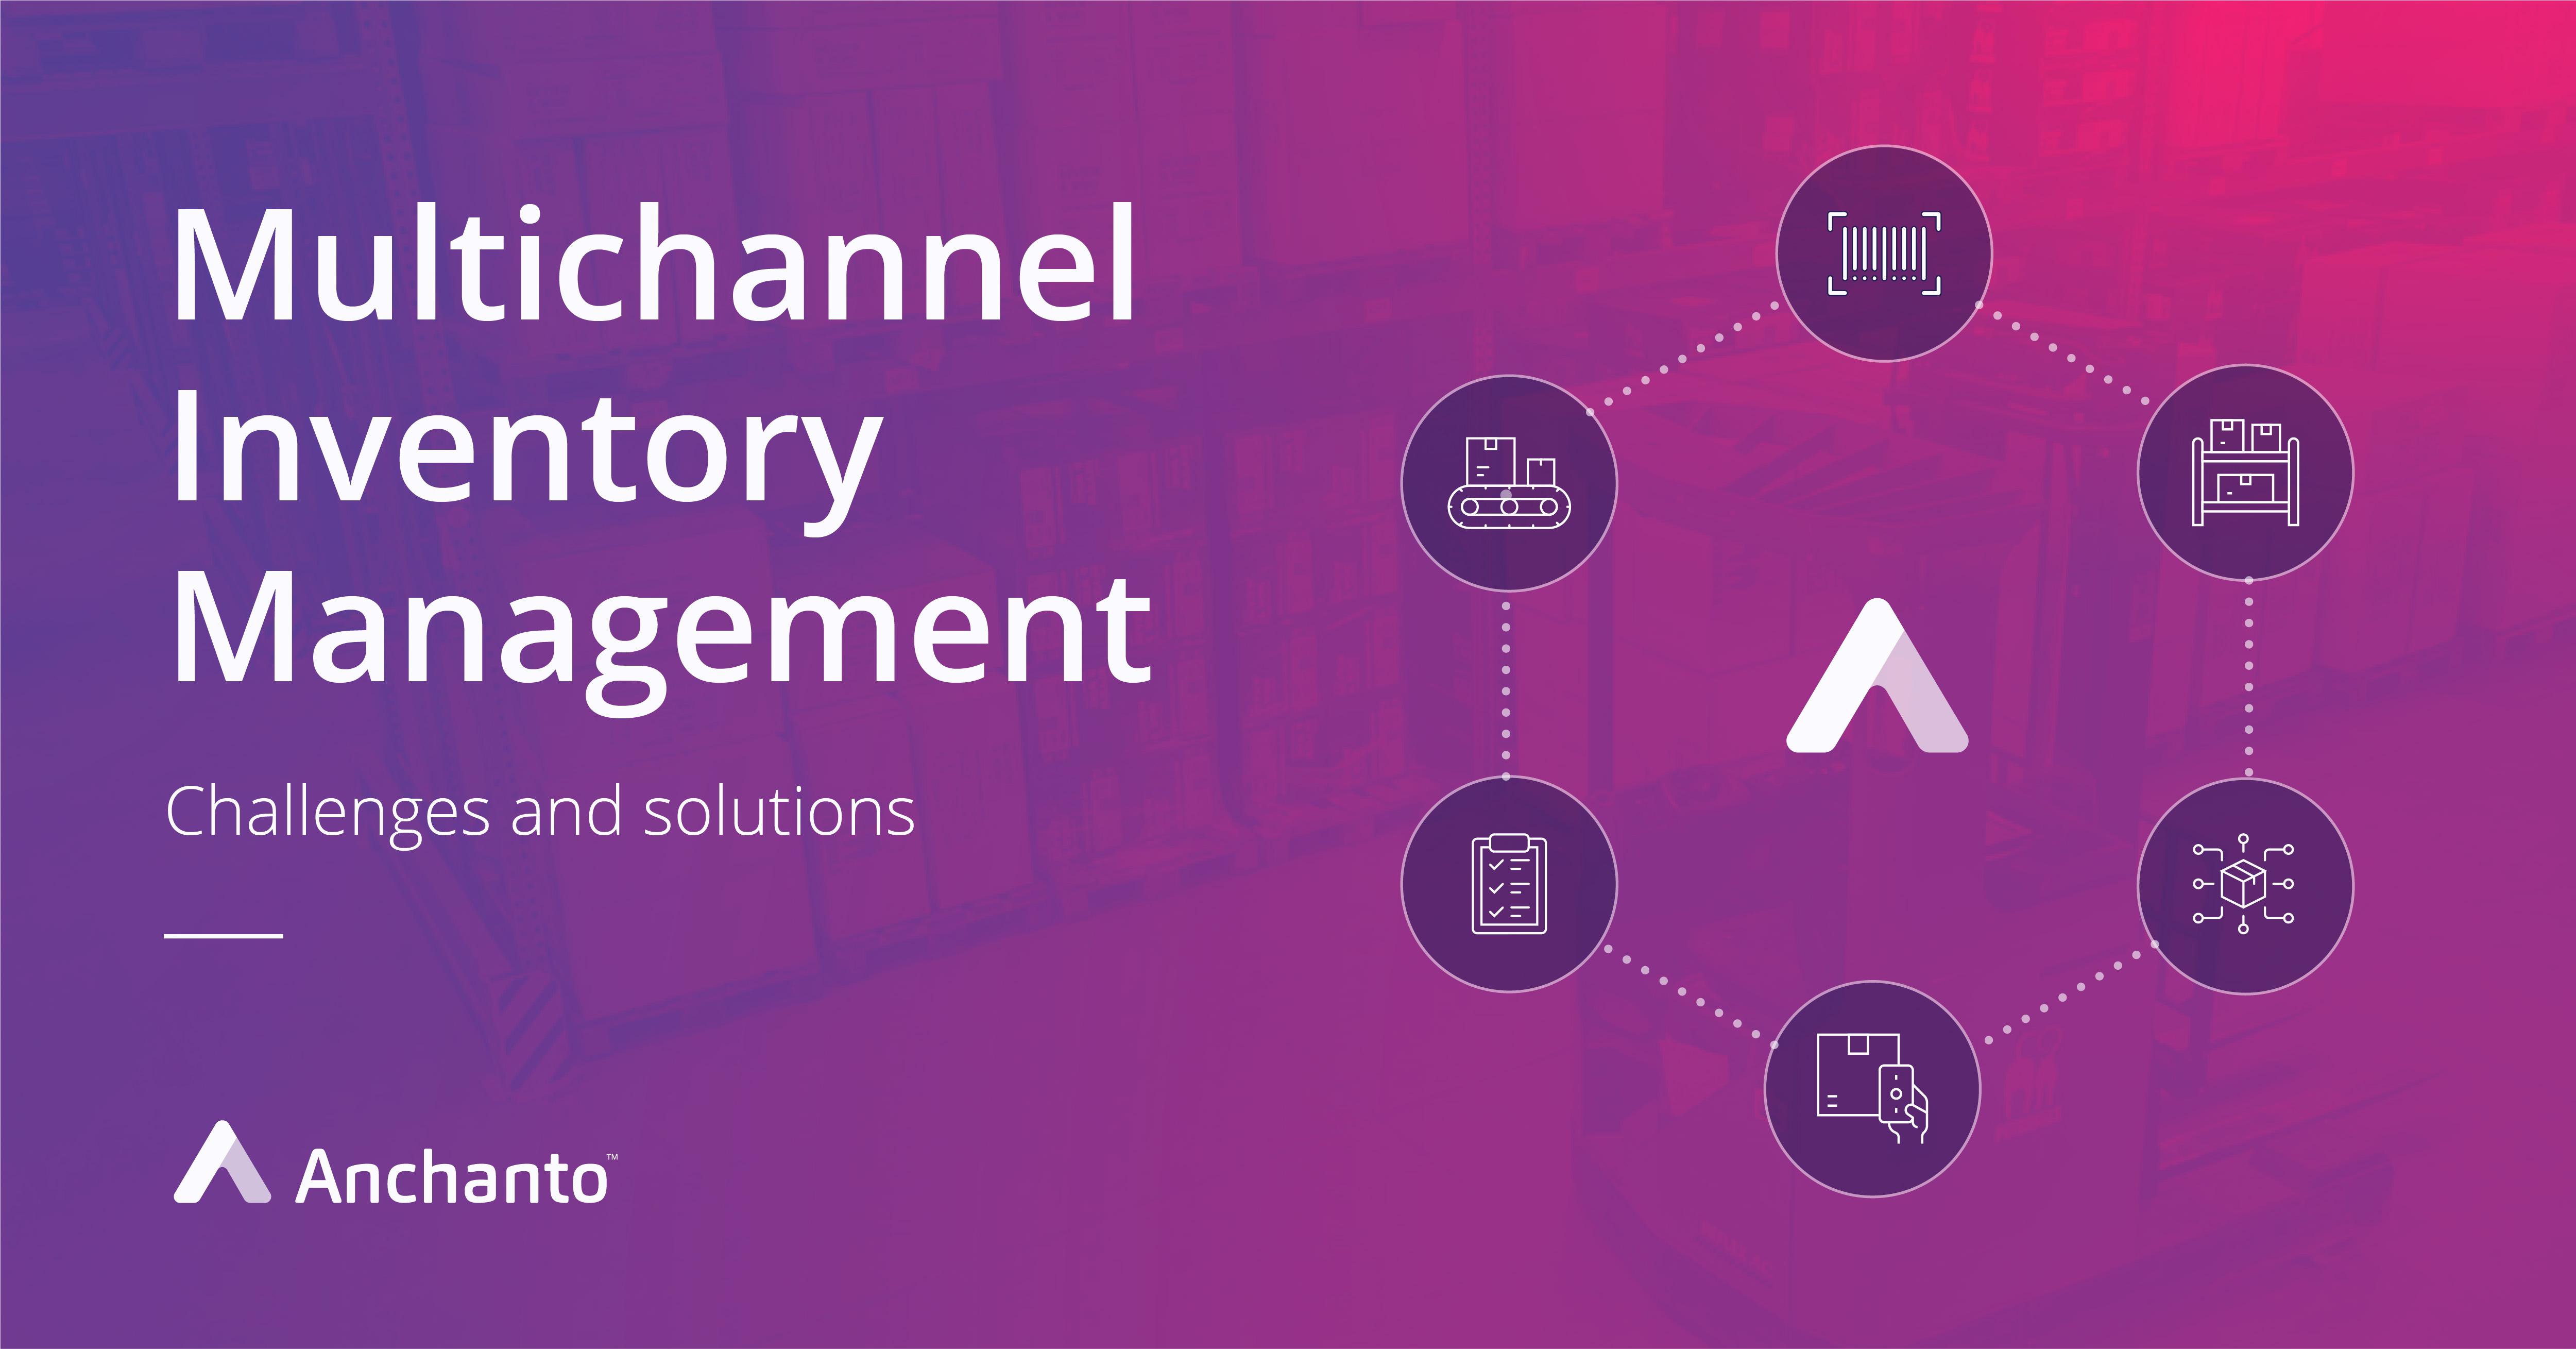 Multichannel Inventory Management